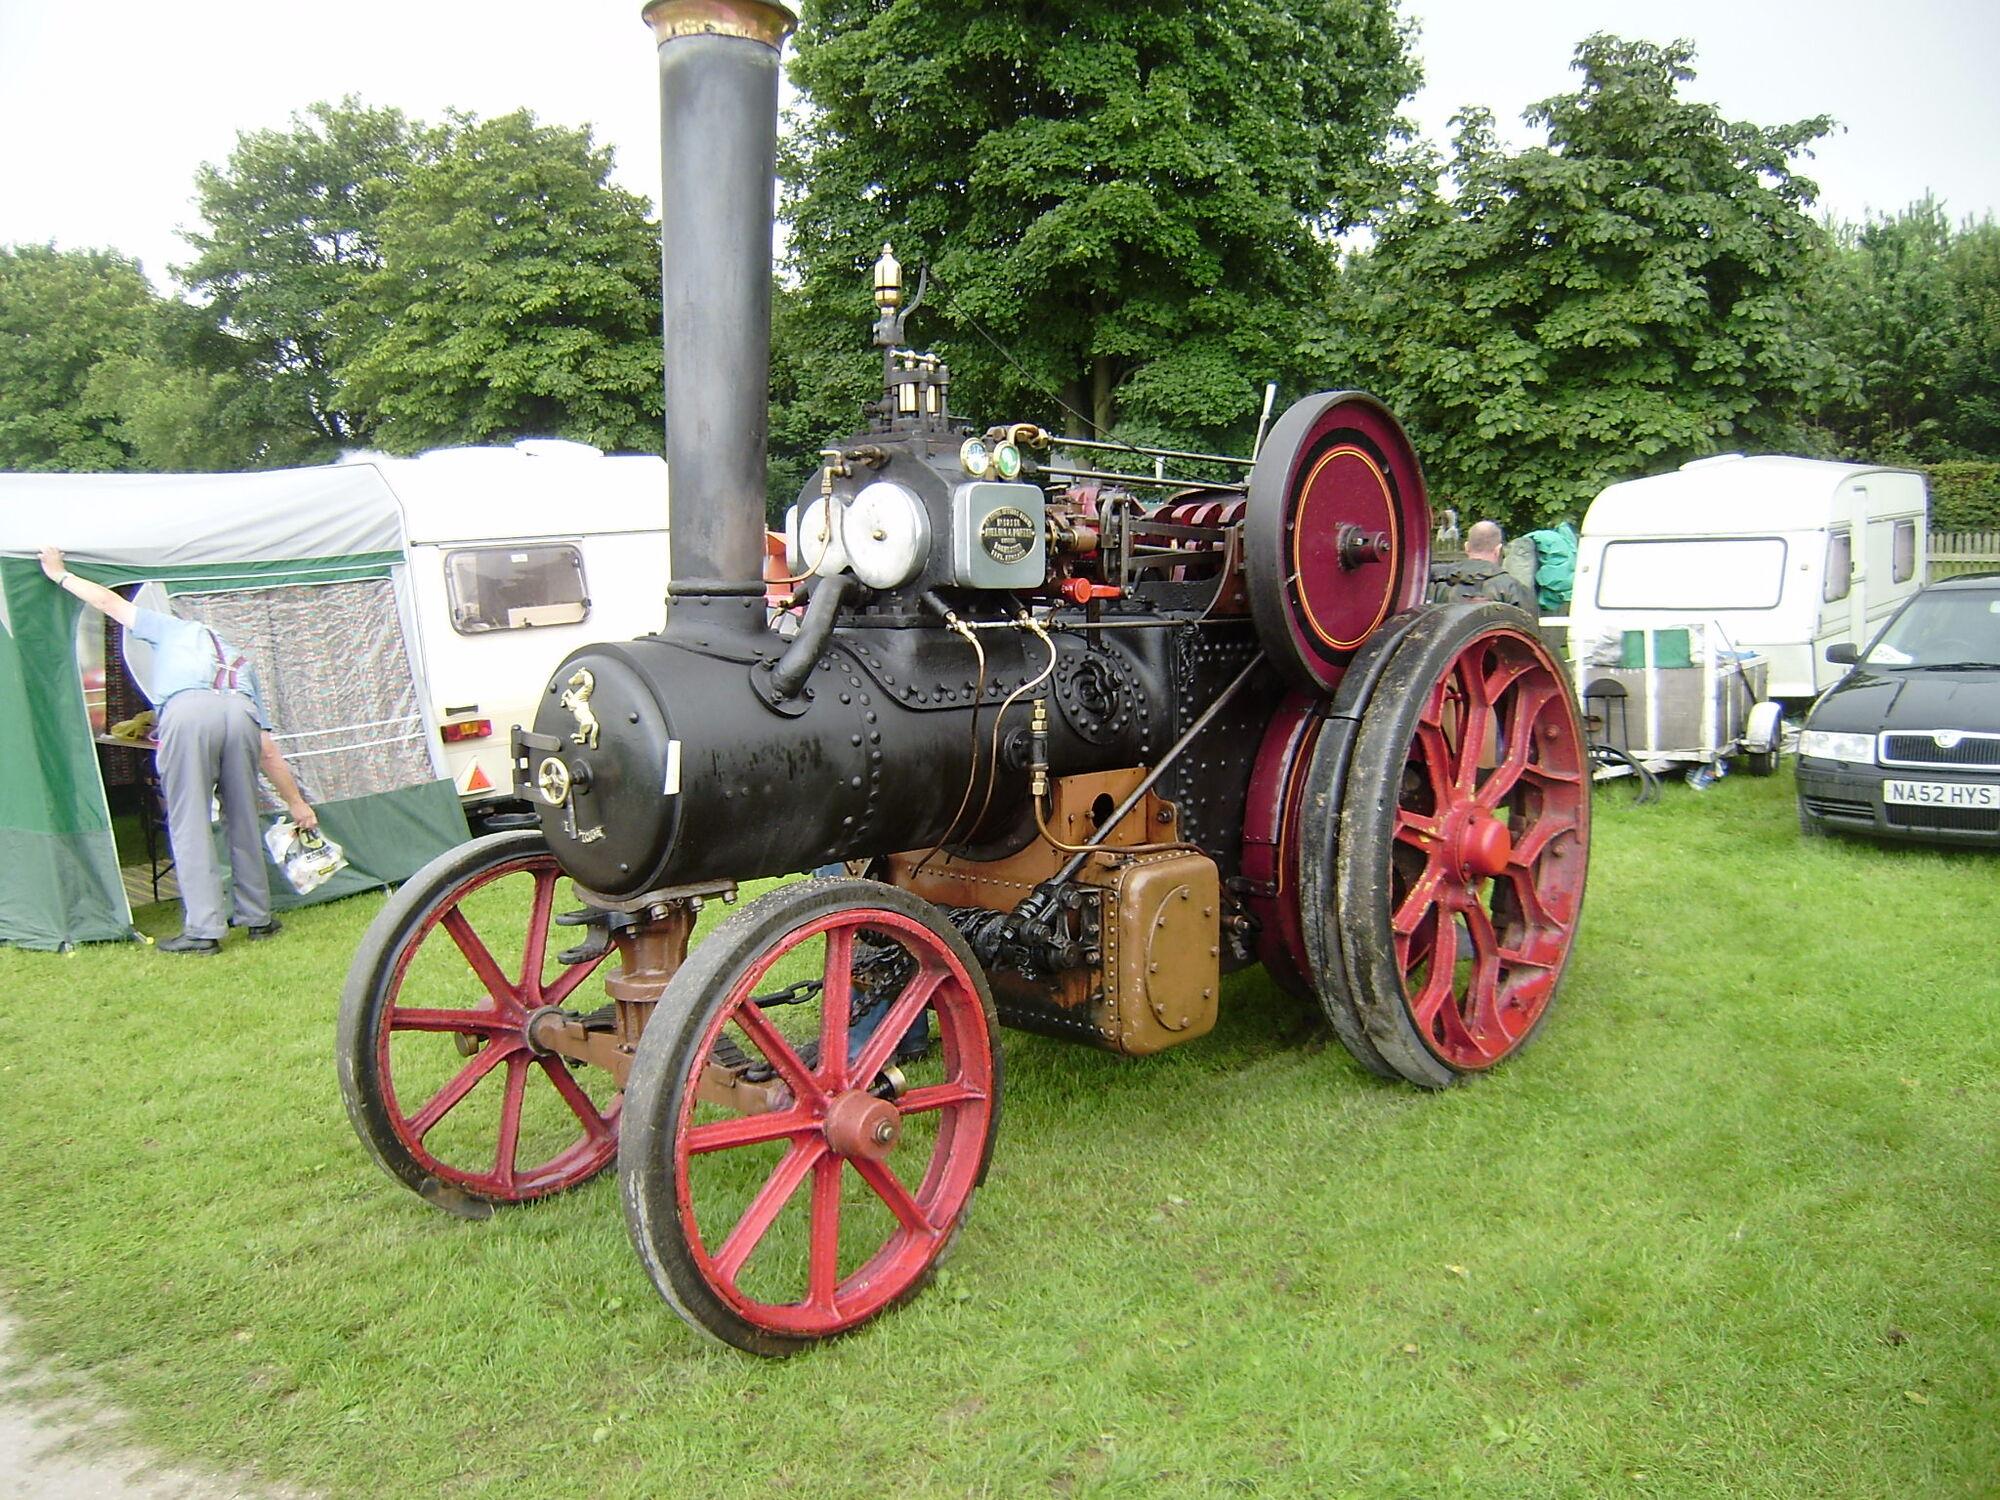 Aveling porter no 12115 tractor construction plant wiki fandom powered by wikia - Porter international wiki ...